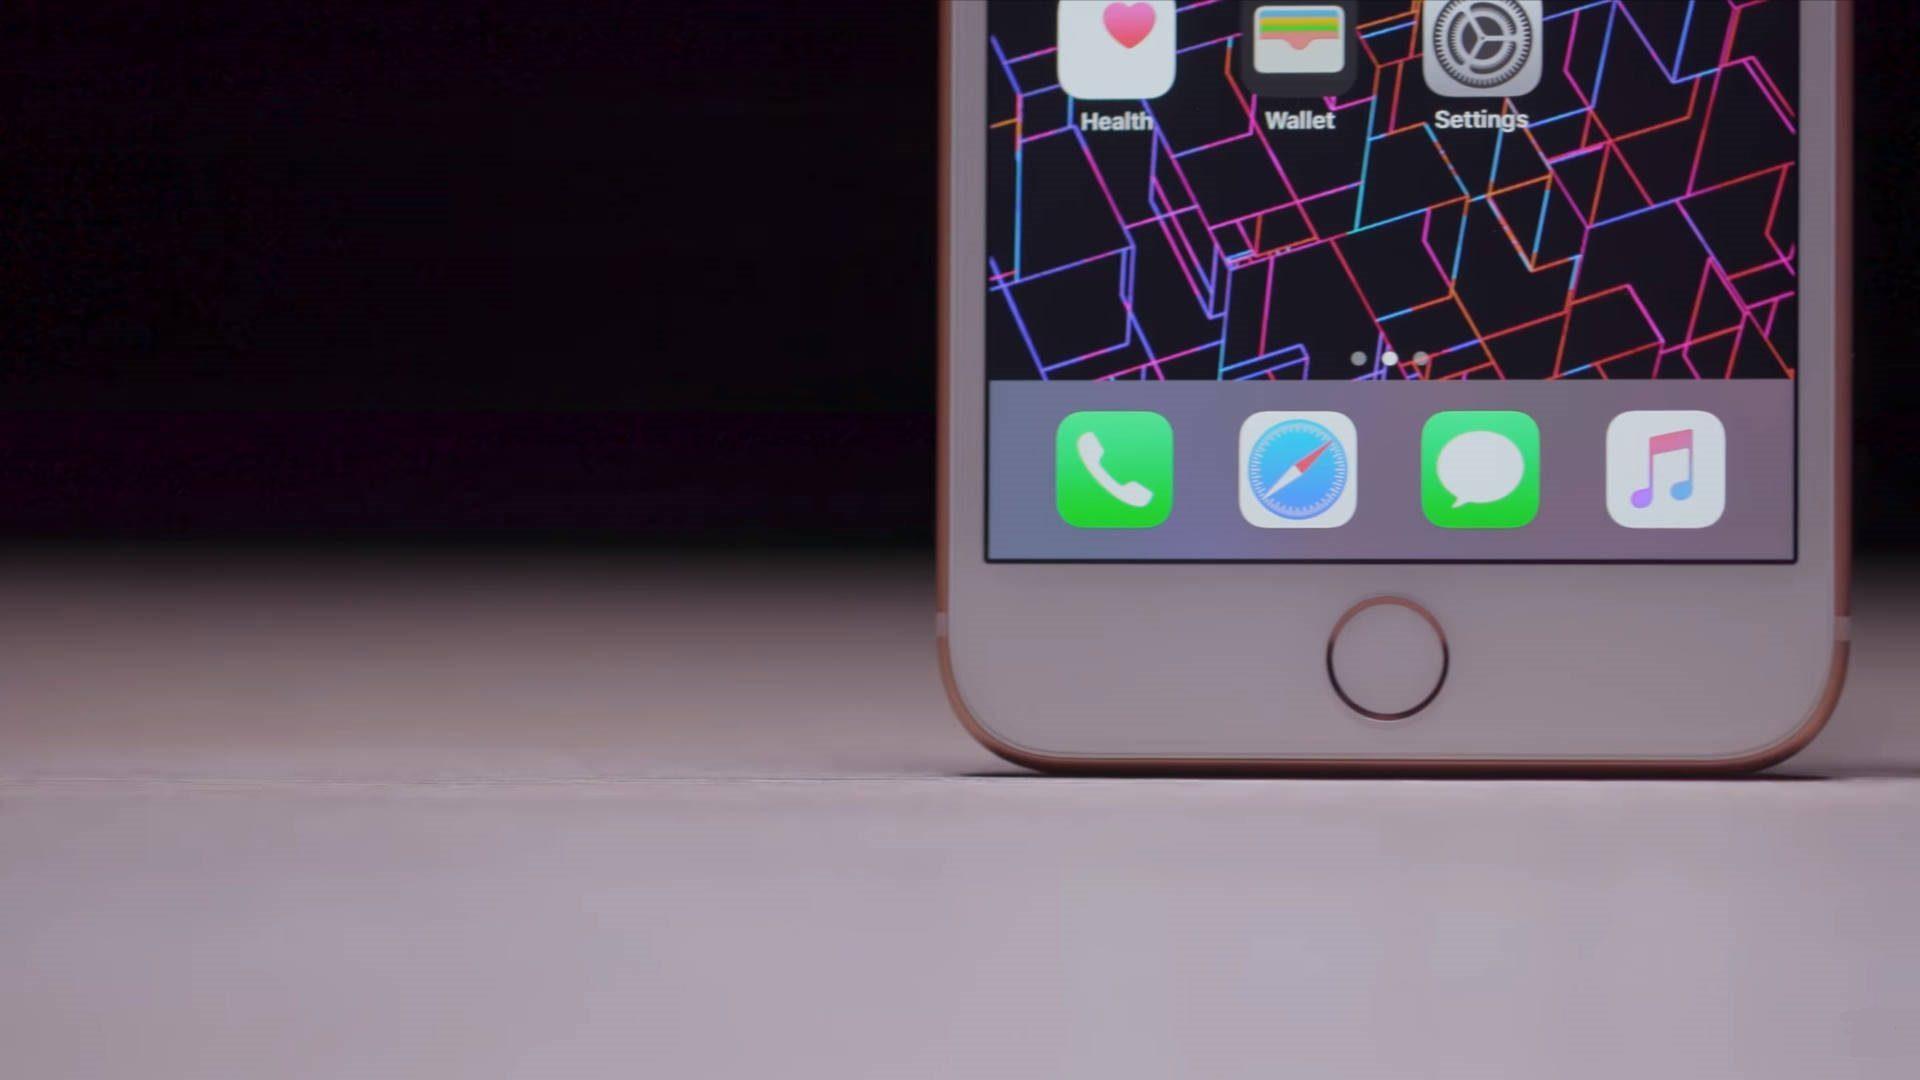 Не удается завершить настройку Touch ID на iPhone